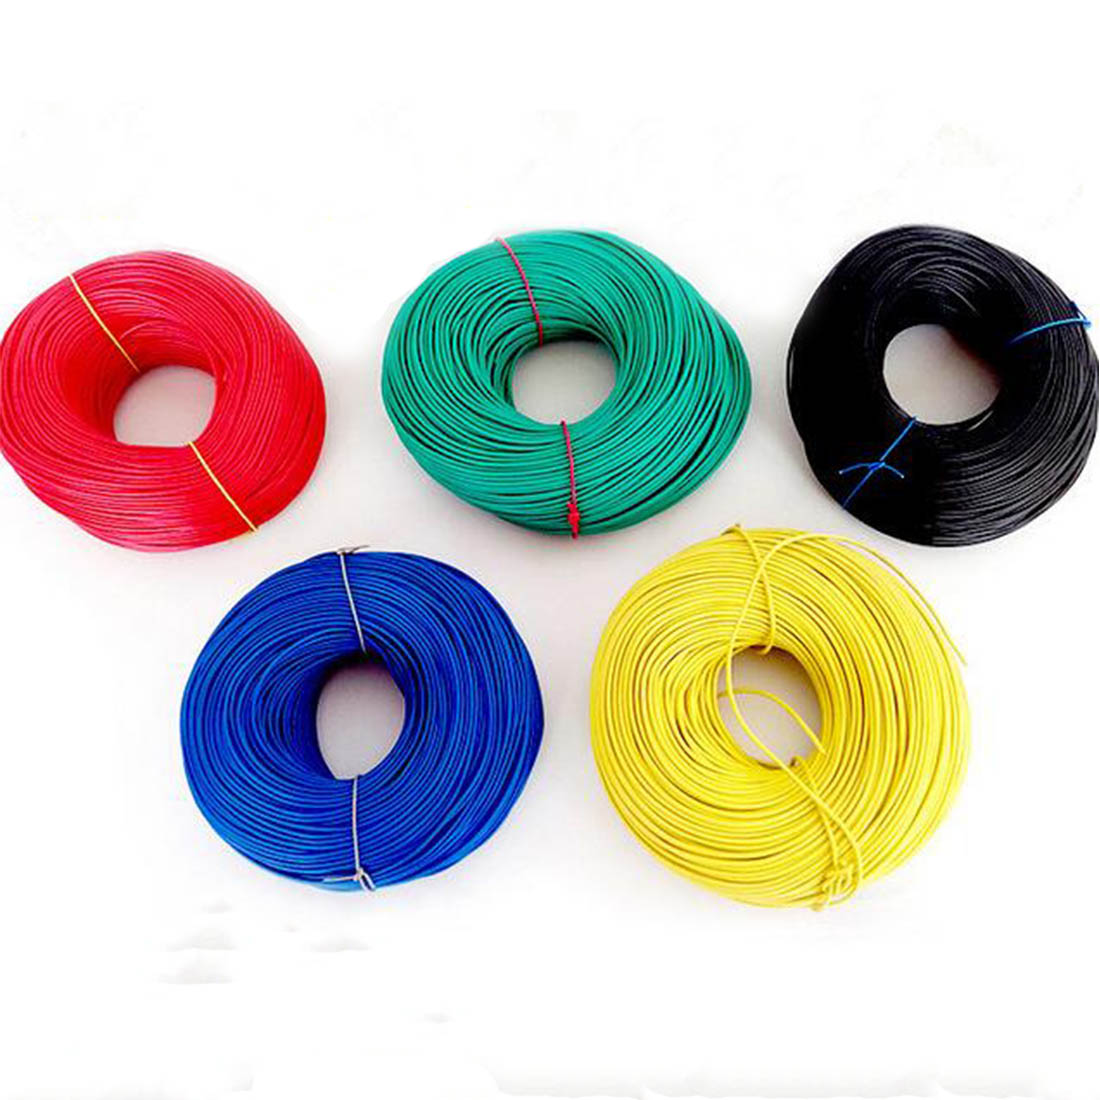 VENSTPOW 5meters/lot RV Wire 1.0mm Square Multi-strand Flexible Stranded Cord Copper Wire DIY 17AWG